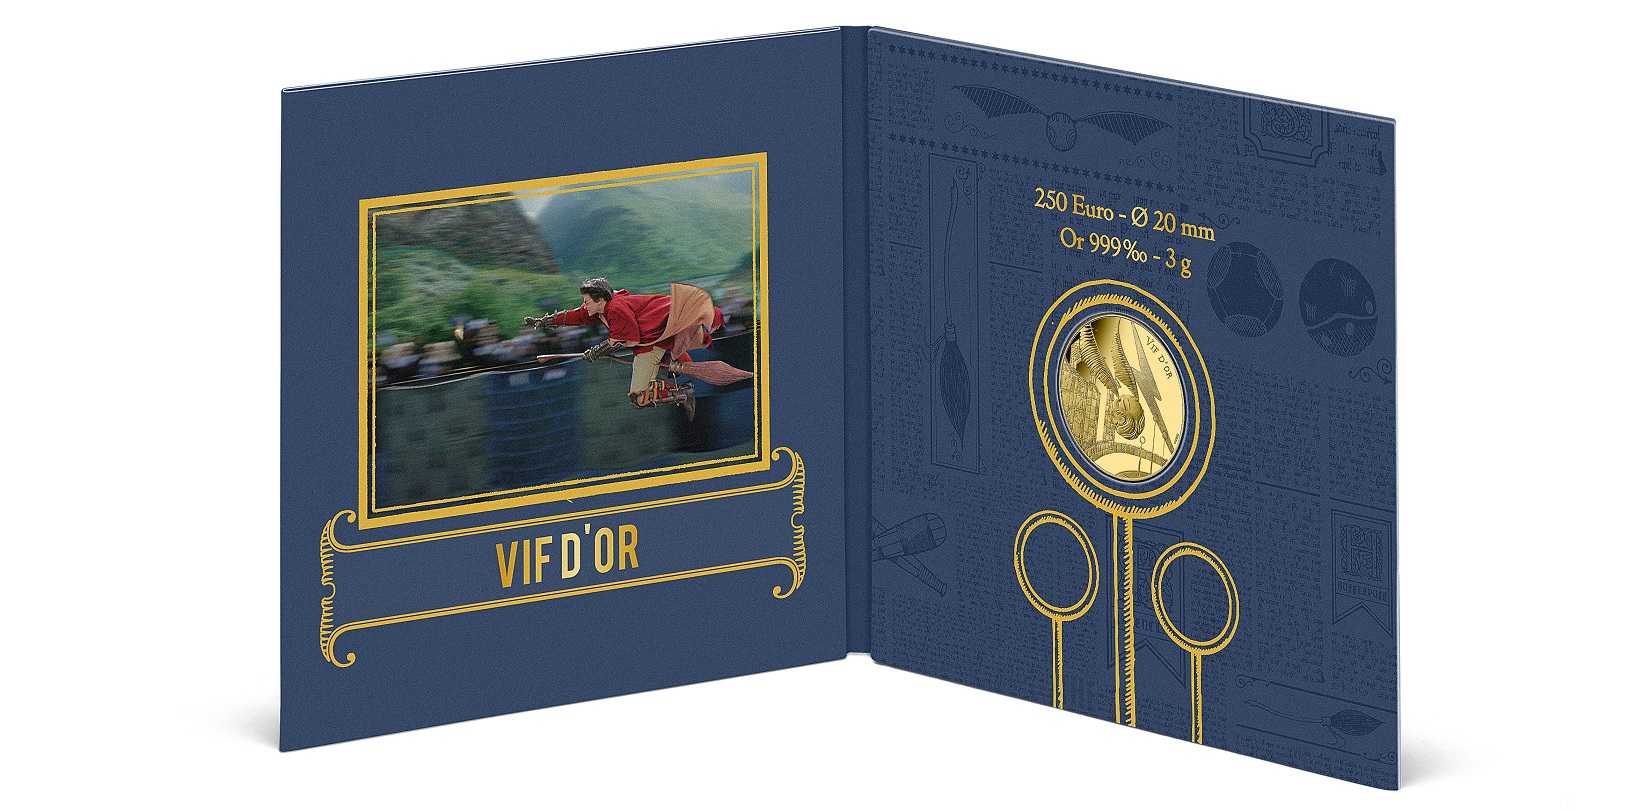 (EUR07.BU.2021.10041356980001) 250 € France 2021 BU Au - Golden Snitch (packaging inside part) (zoom)